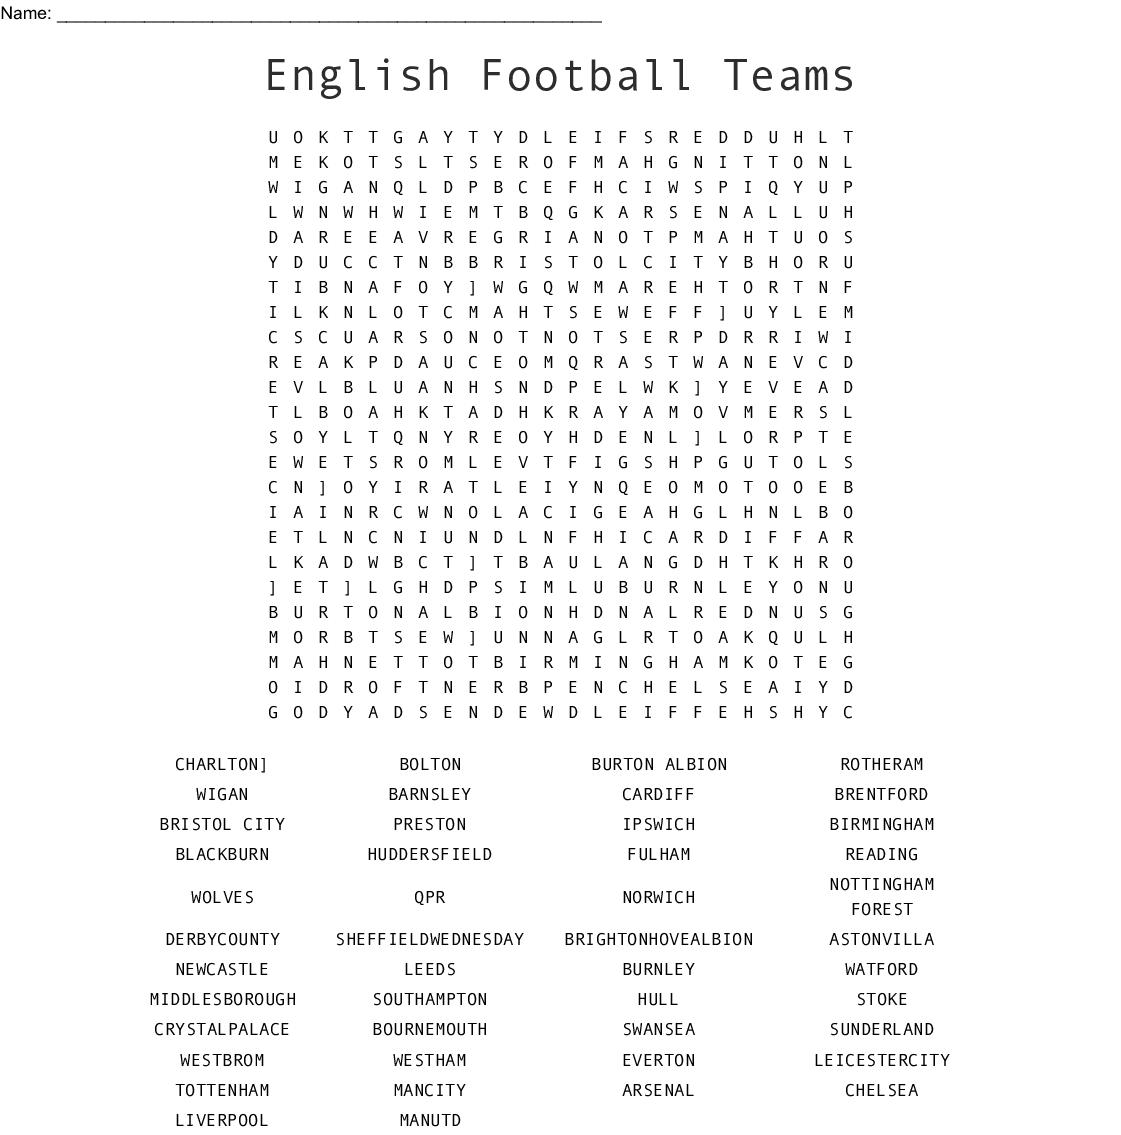 English Football Teams Word Search - Wordmint